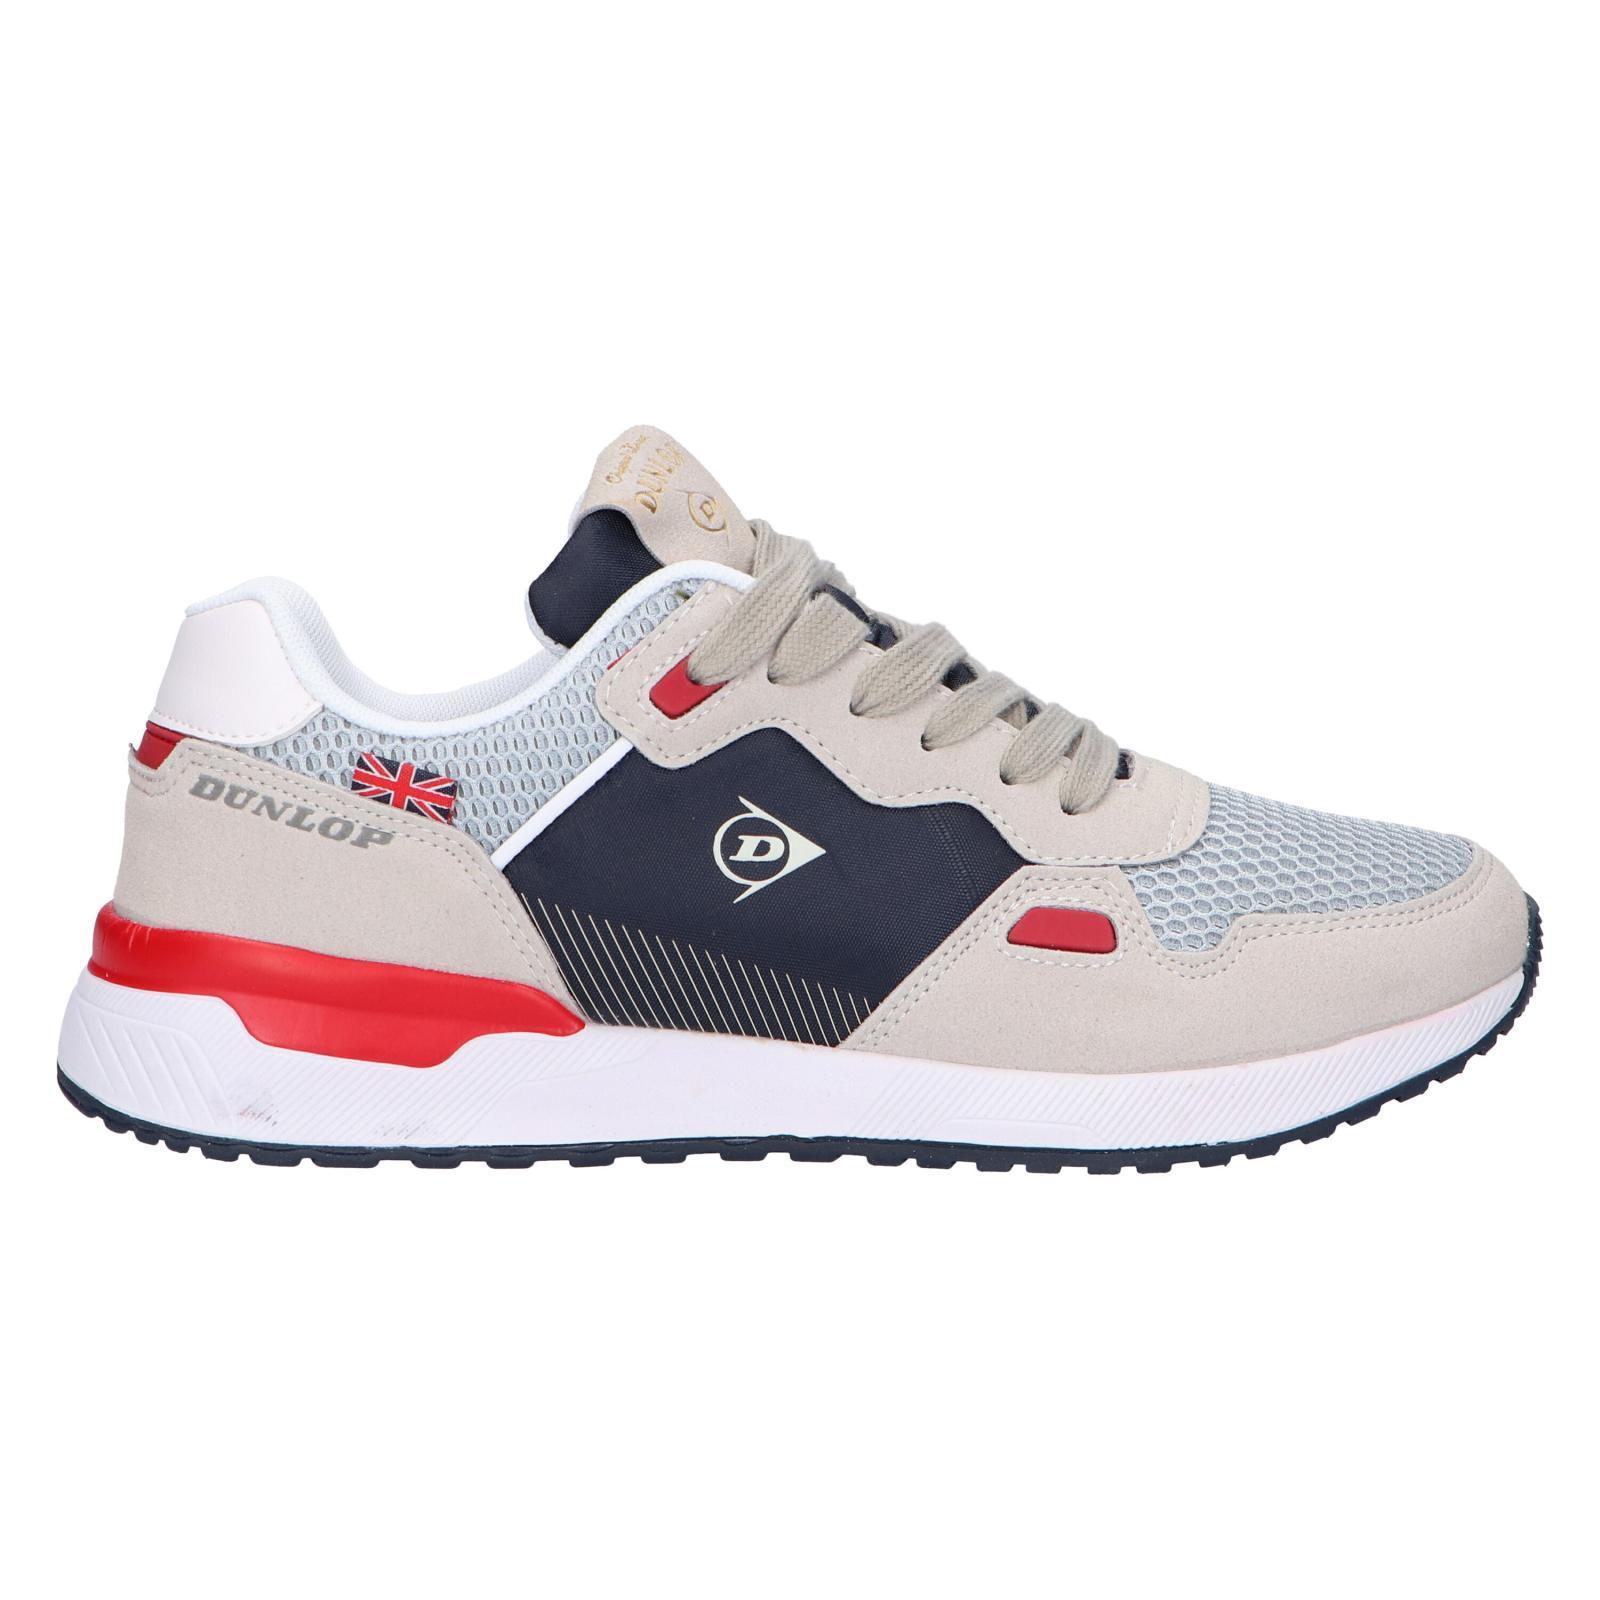 Zapatillas Dunlop 35511 107 marino